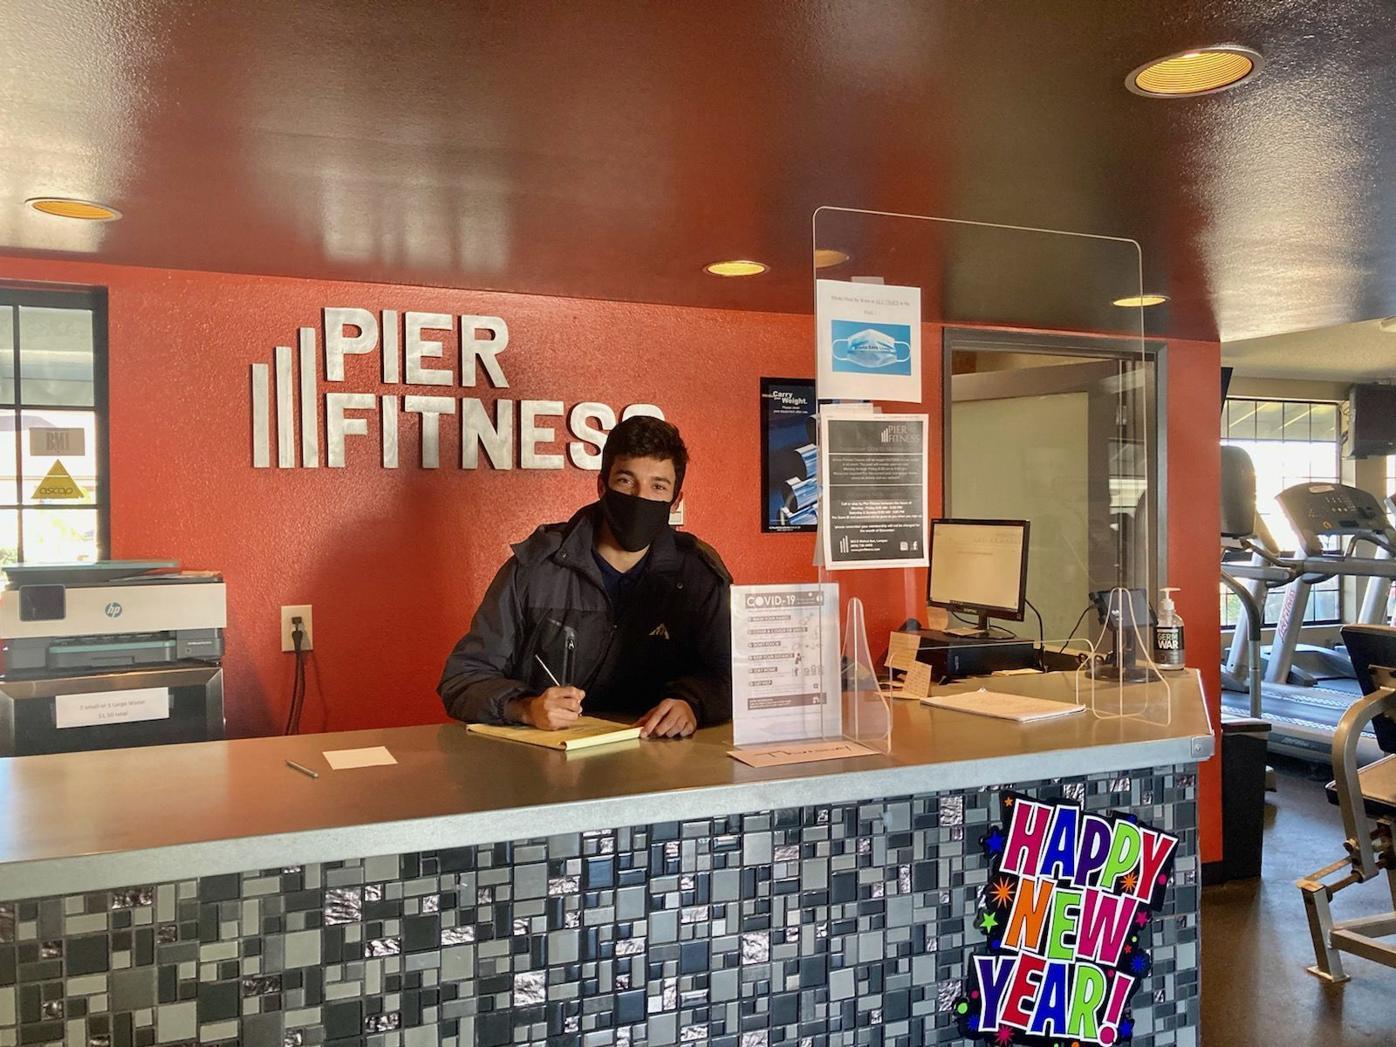 010521 Pier Fitness 1.jpg